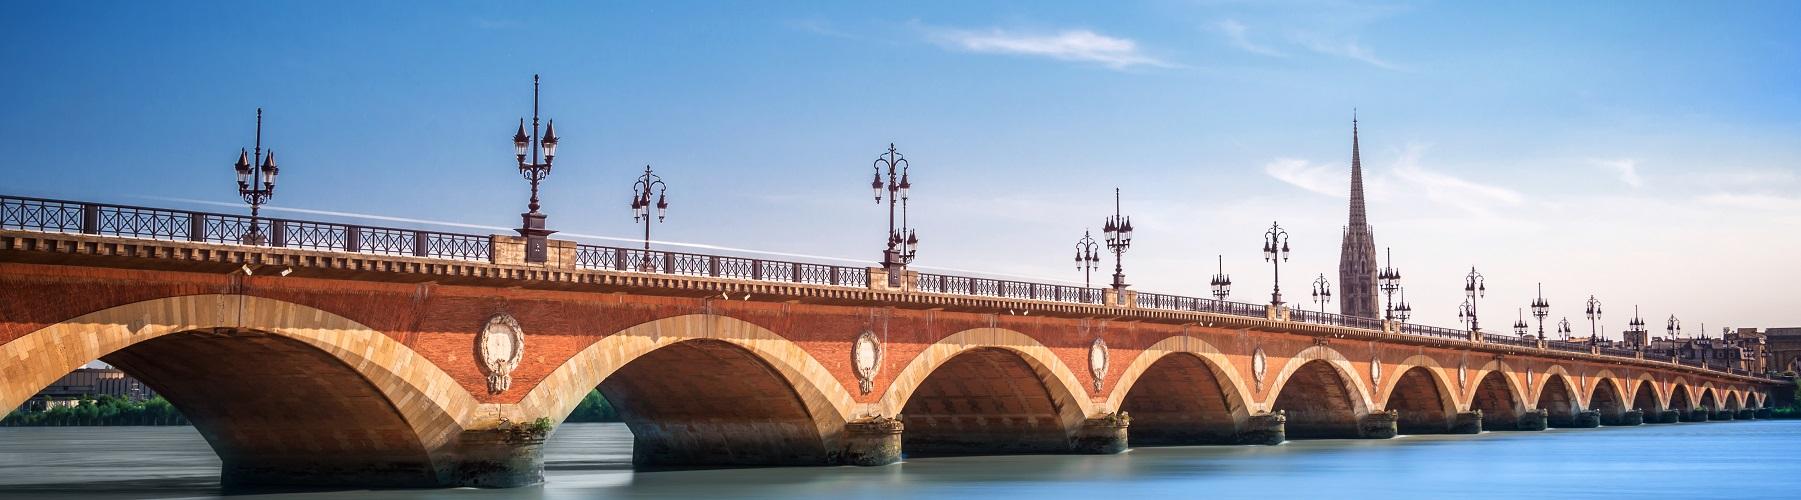 Alternance Gironde – Bordeaux